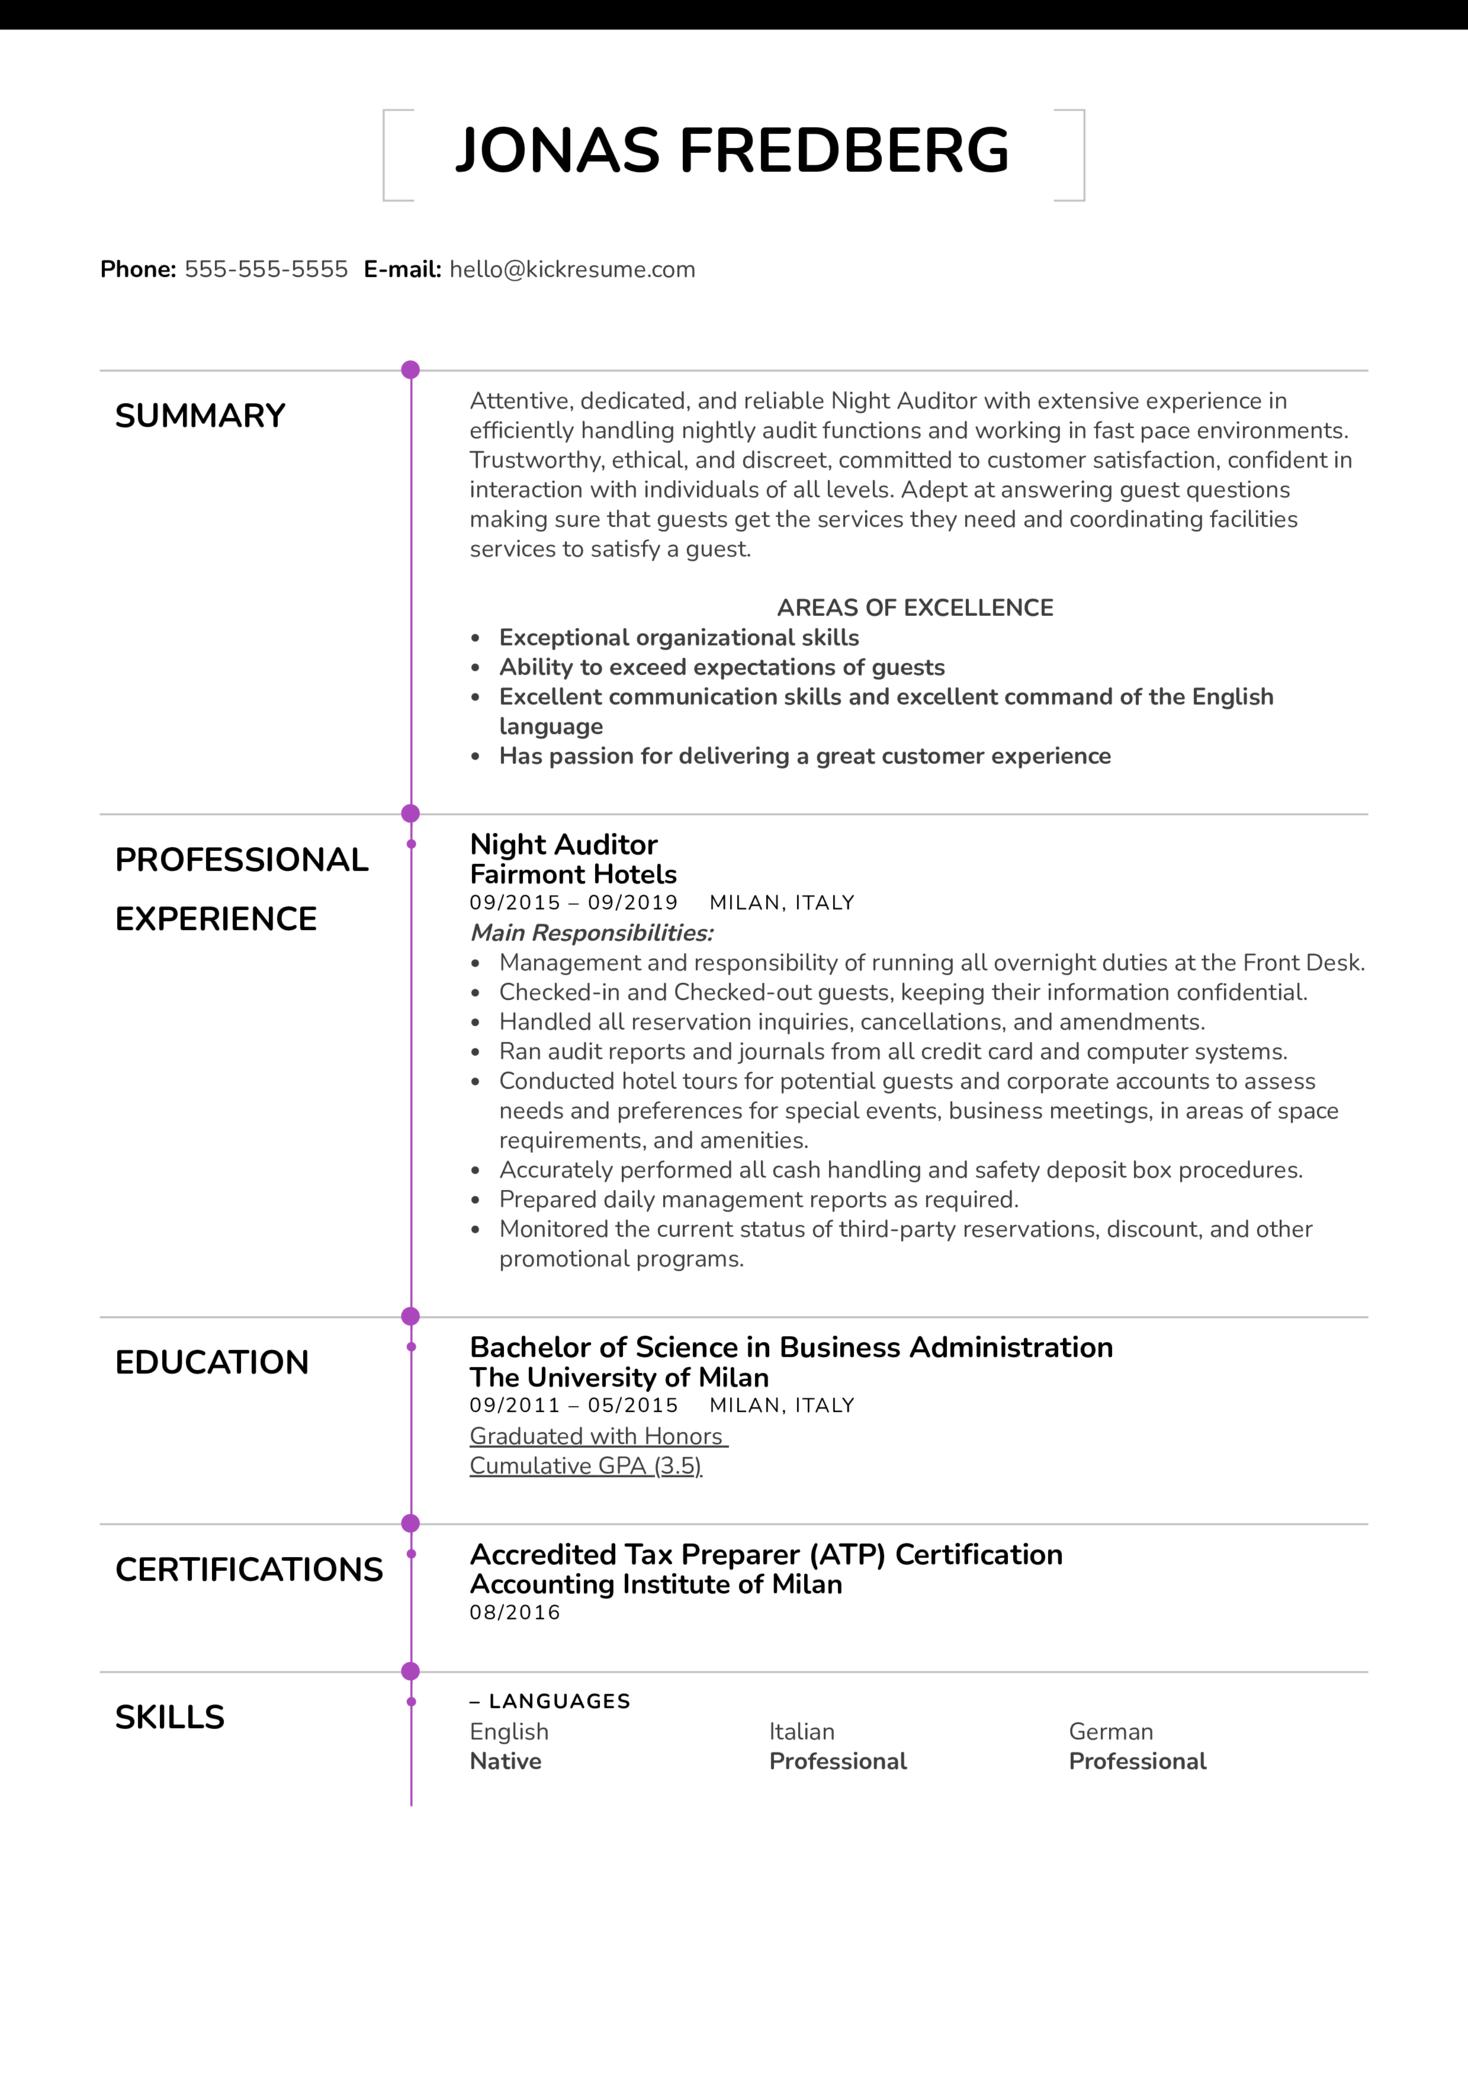 Night Auditor Resume Example (parte 1)